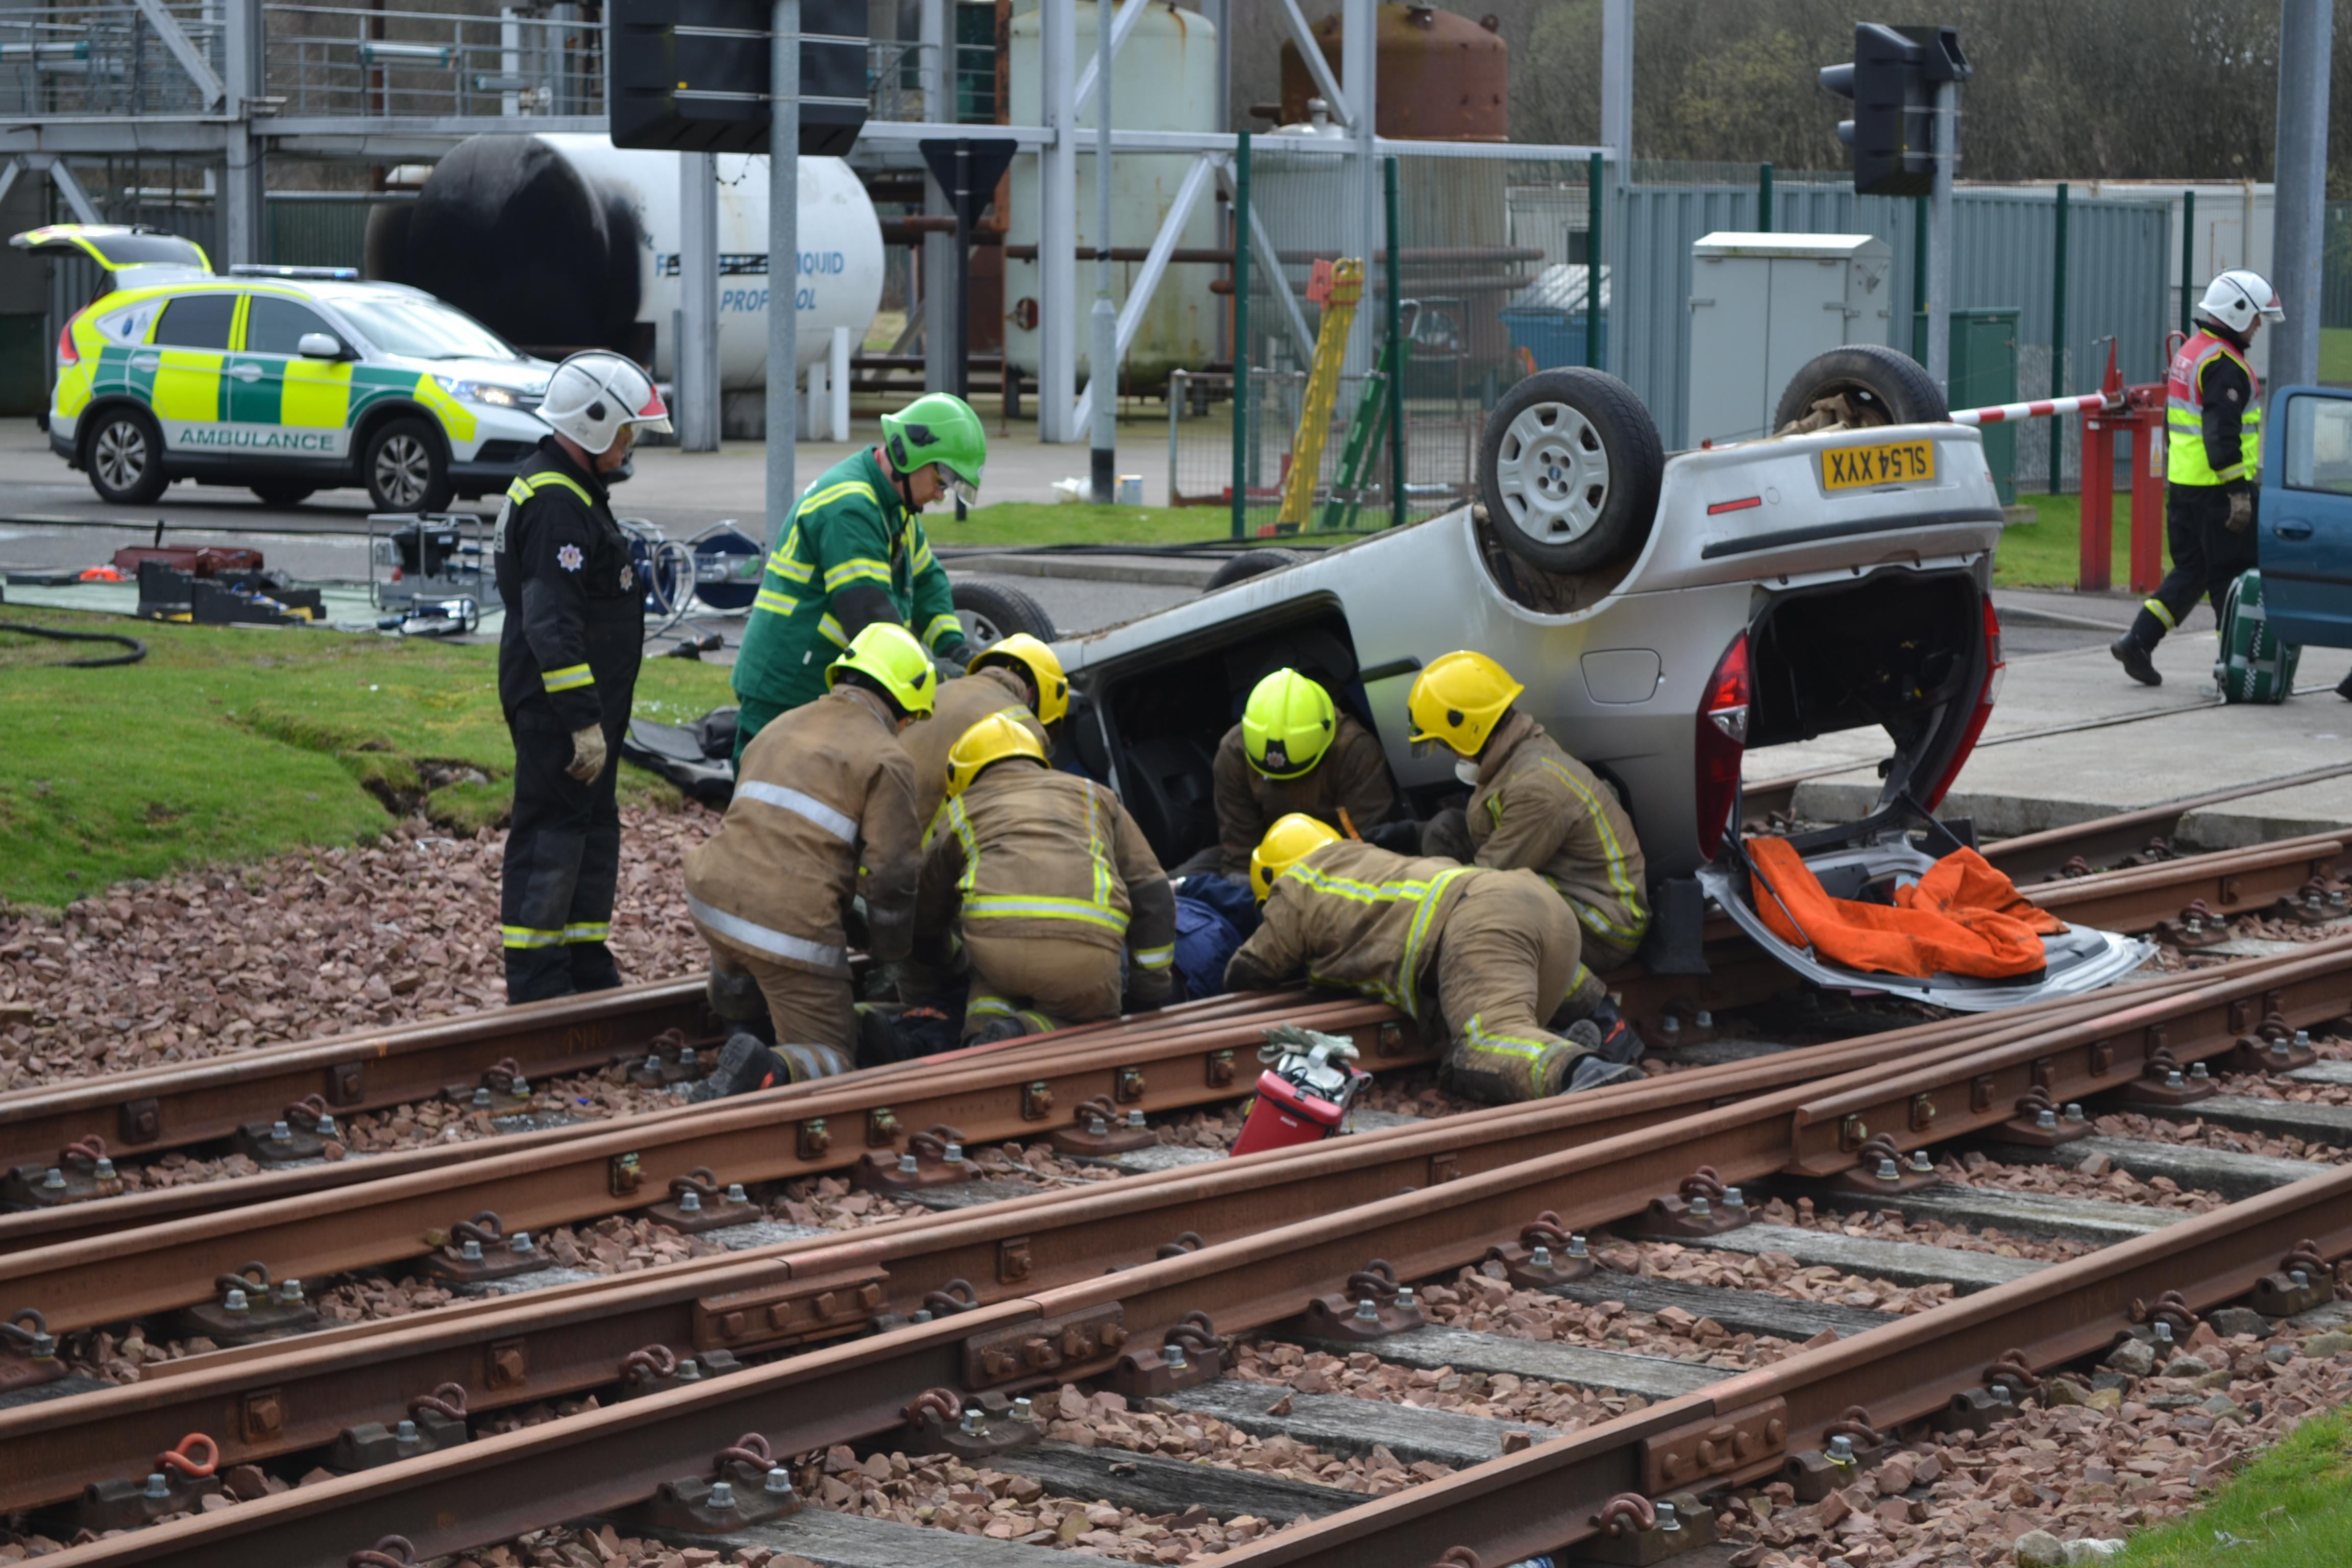 Trainee firefighters in disaster scenario exercise